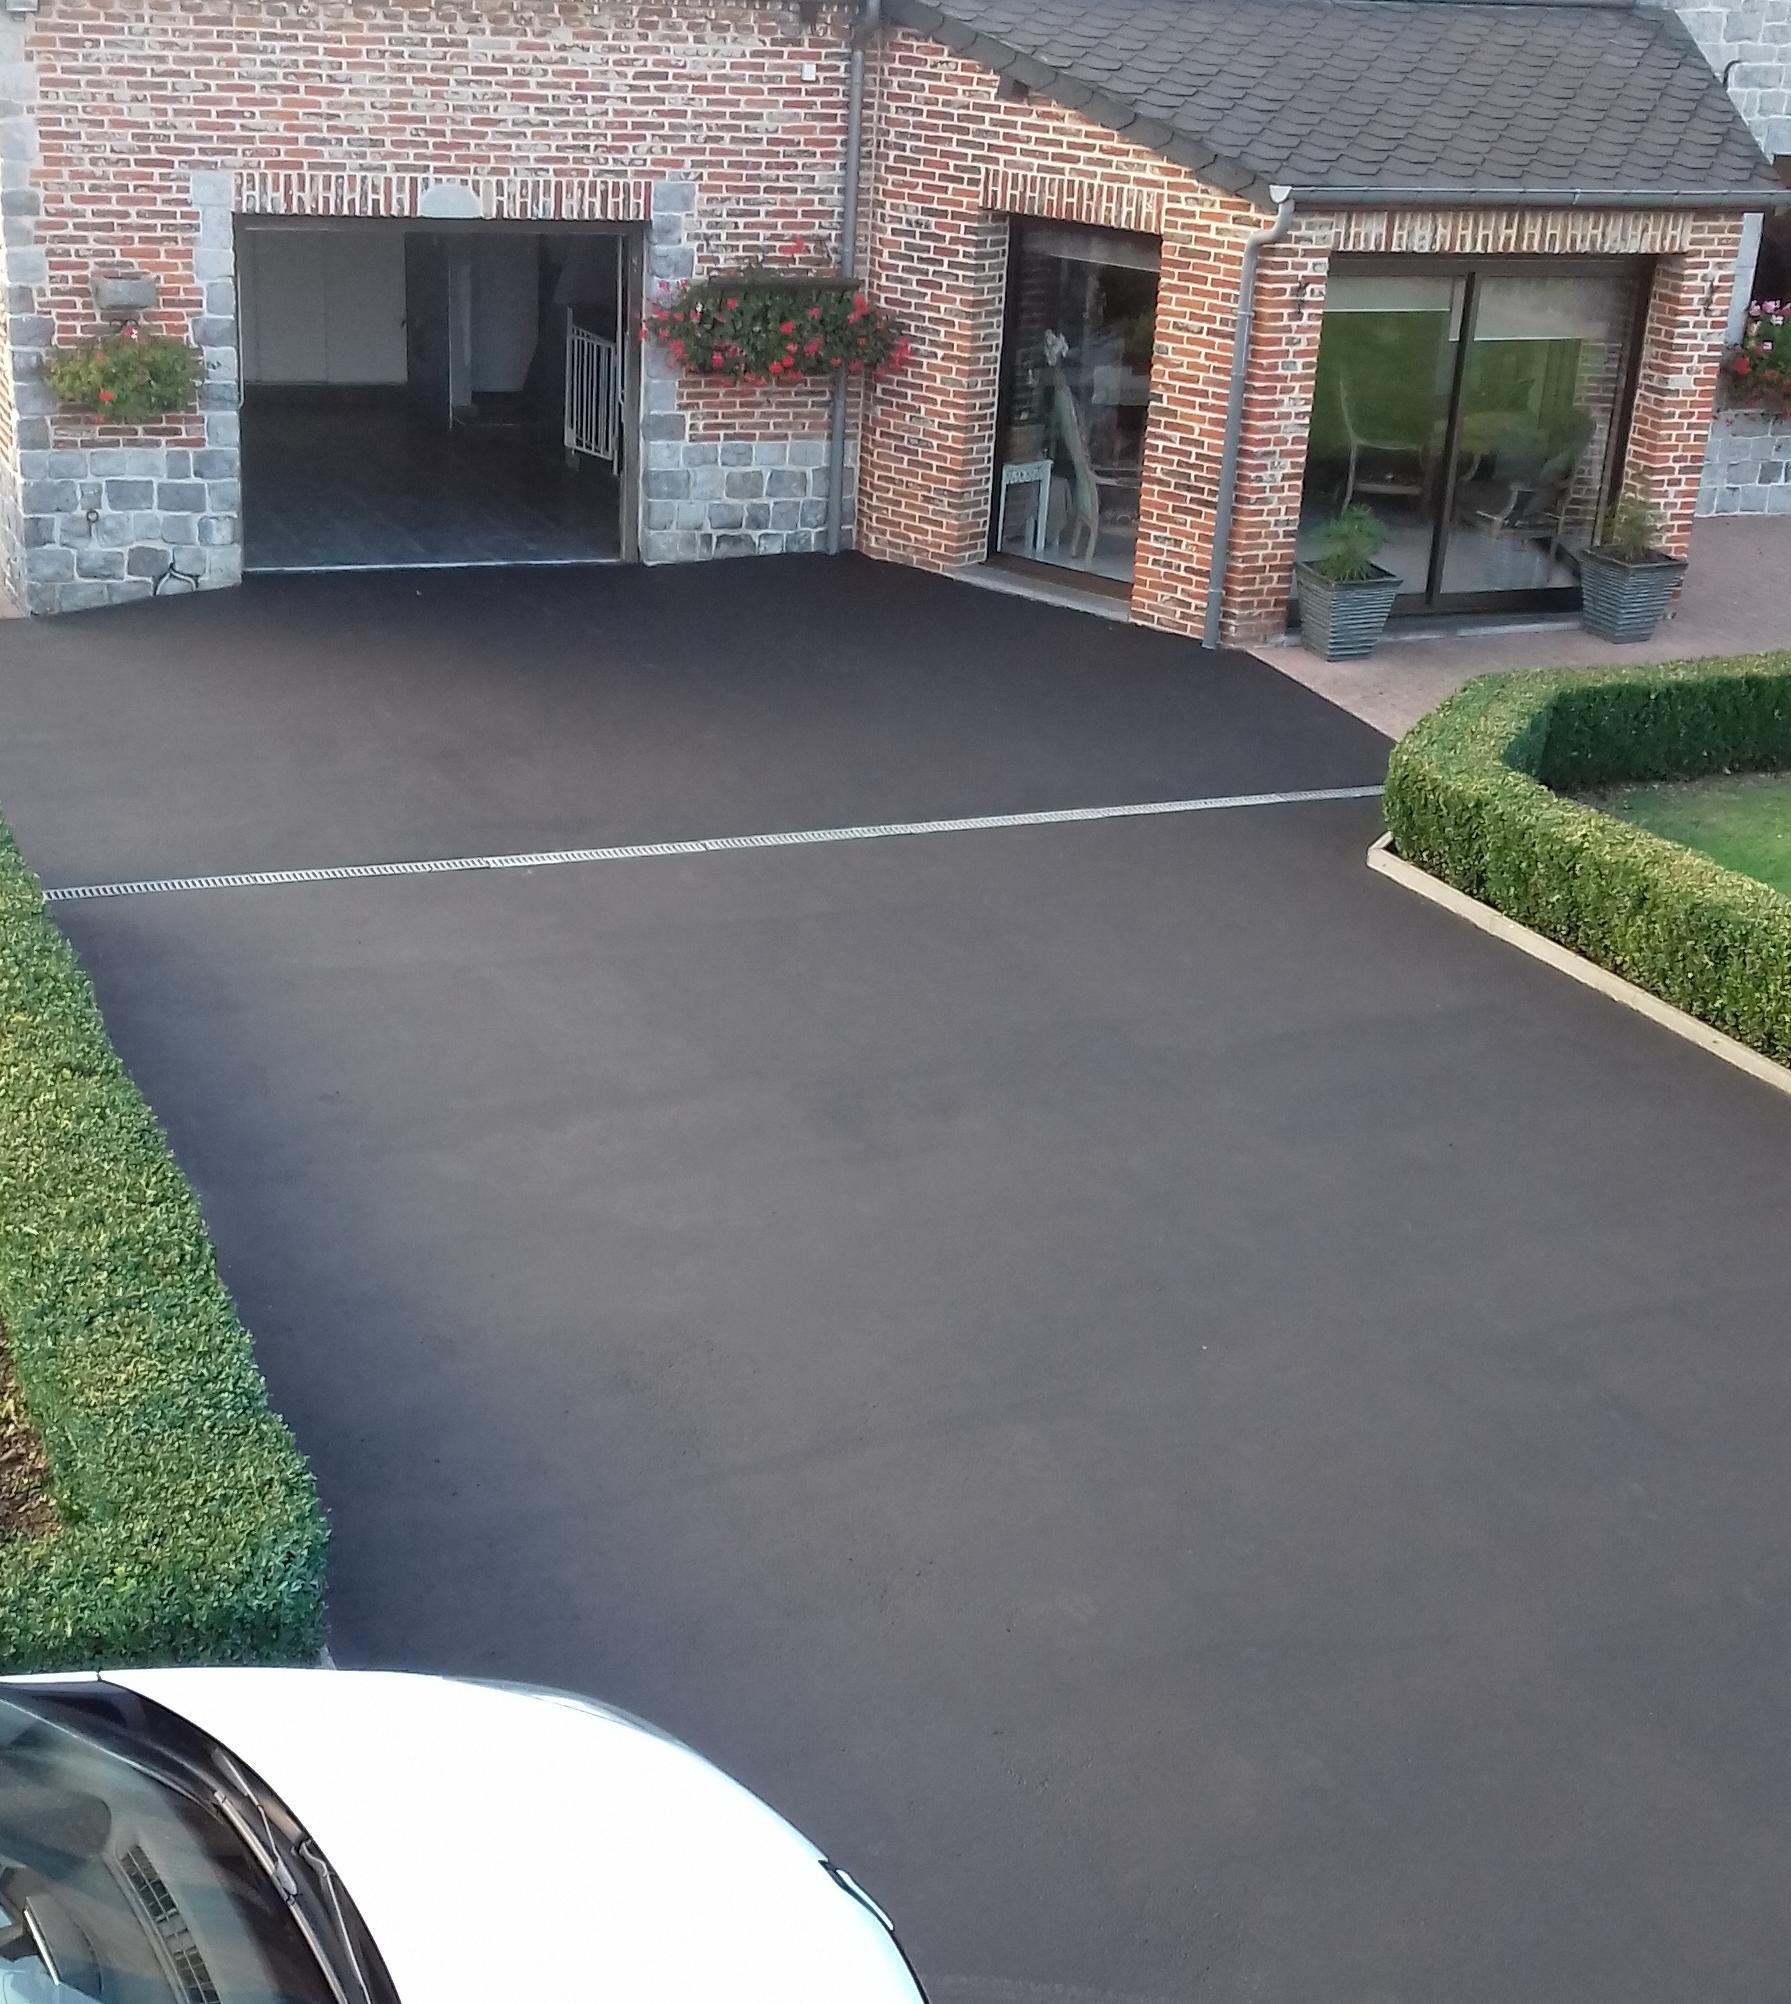 rev tement protection antid rapant pour sol de garage parking enrob s bitumeux. Black Bedroom Furniture Sets. Home Design Ideas